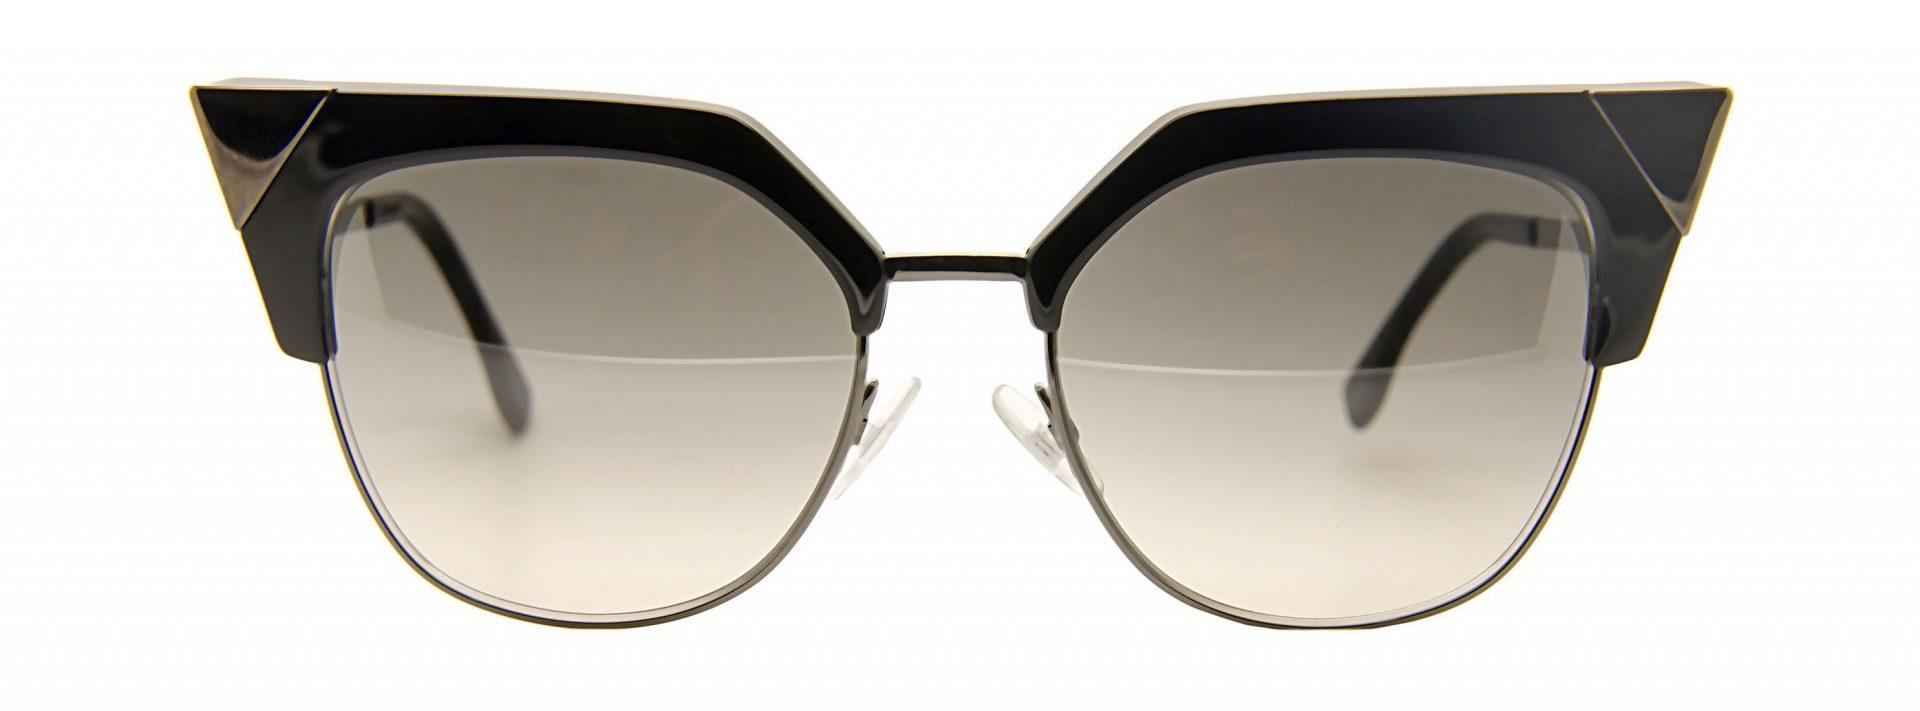 Fendi sunglasses 0149 Kklic 01 2970x1100